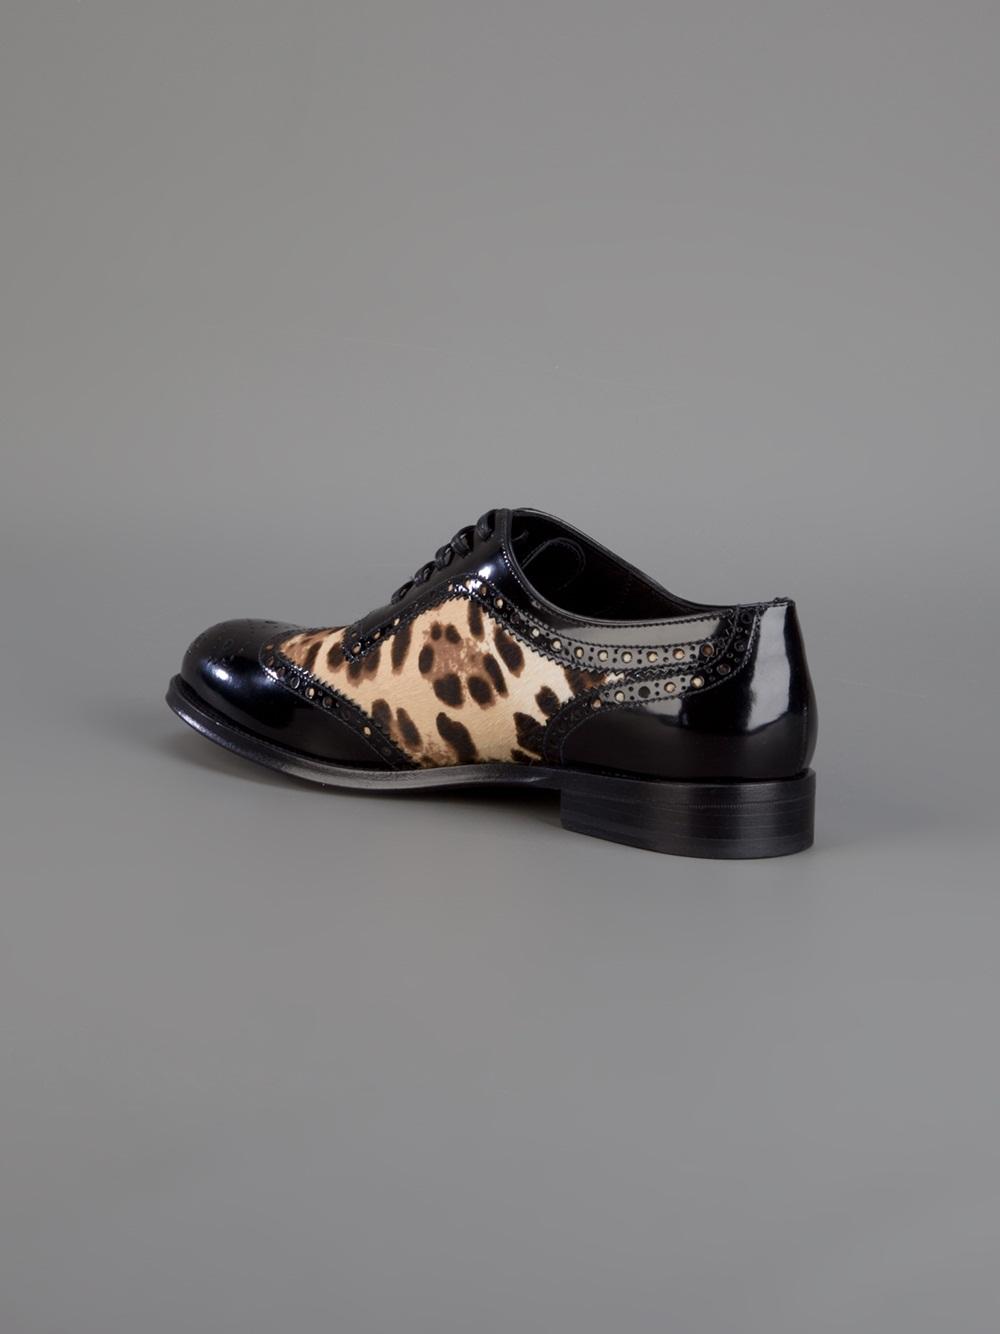 Dolce Amp Gabbana Leopard Print Brogues In Brown Lyst